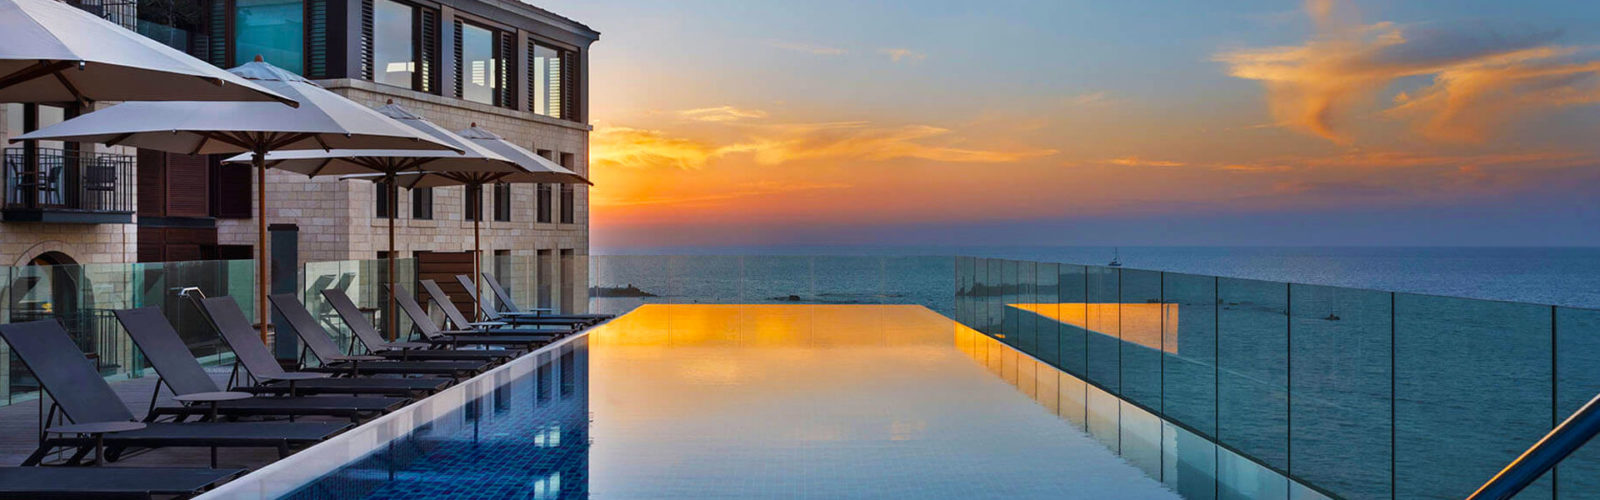 Séjour à l'hôtel The Setai, à Jaffa